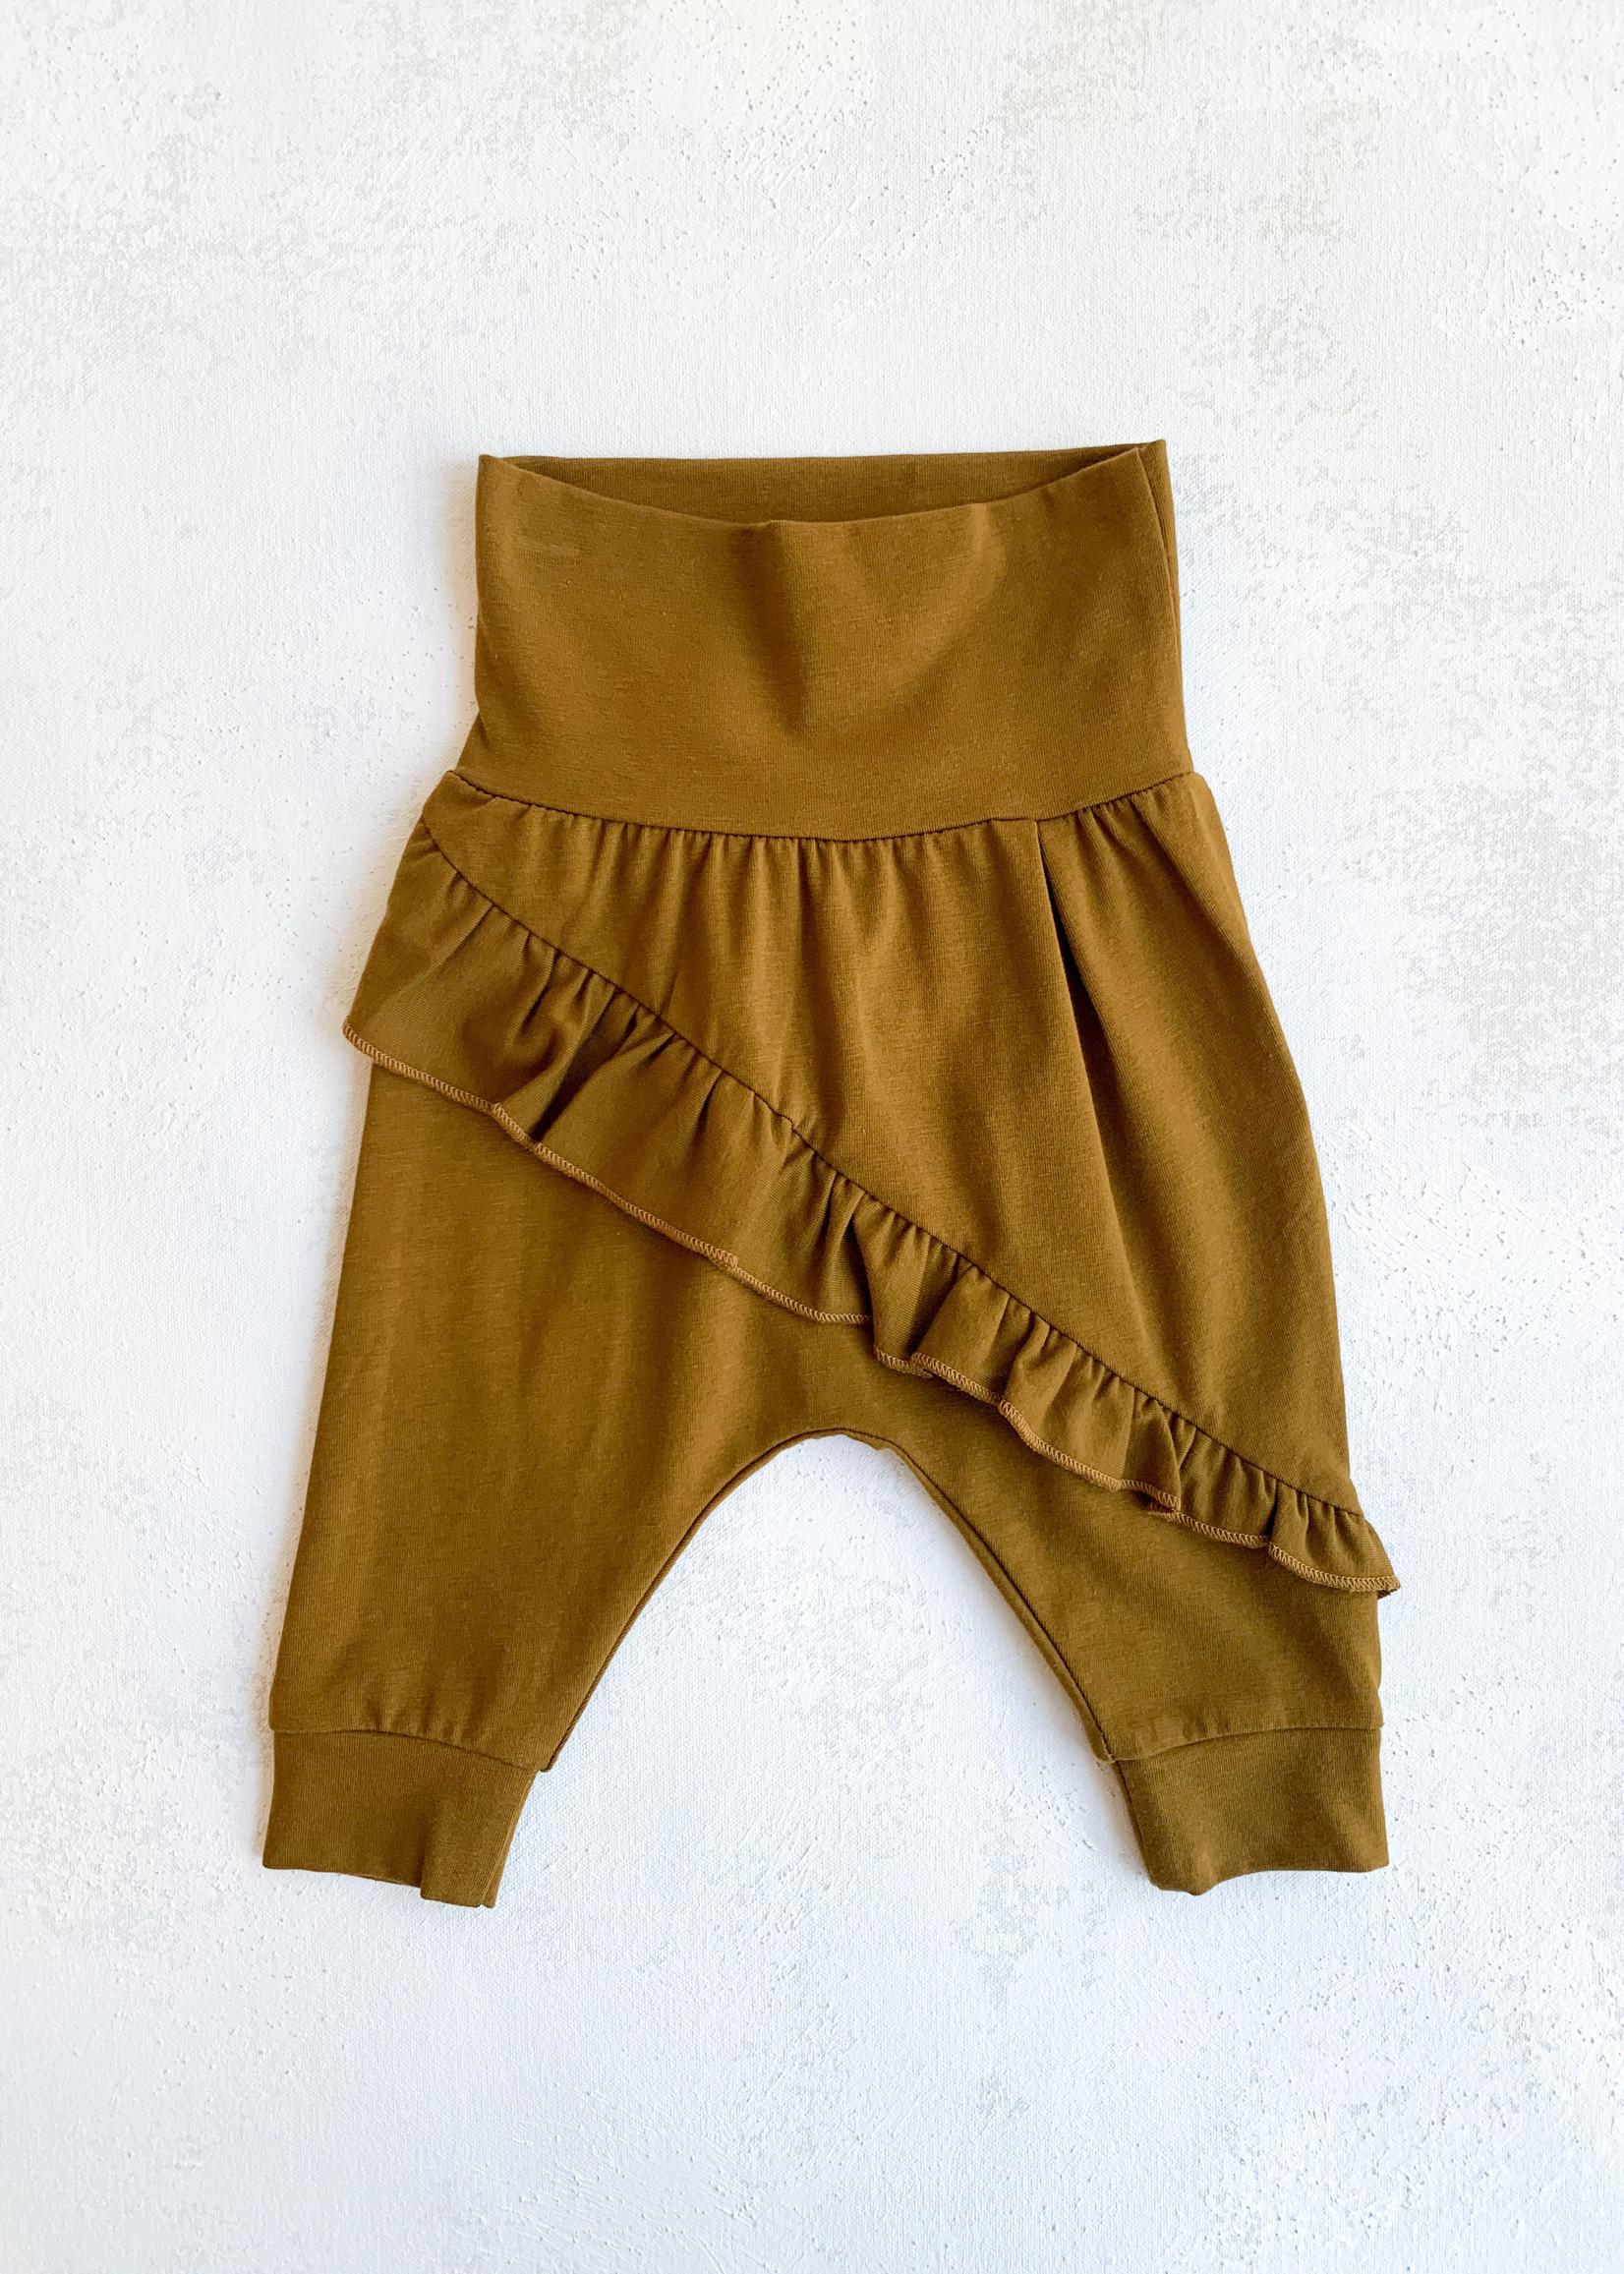 Elitaire Petite Frill Pants in Antique Gold